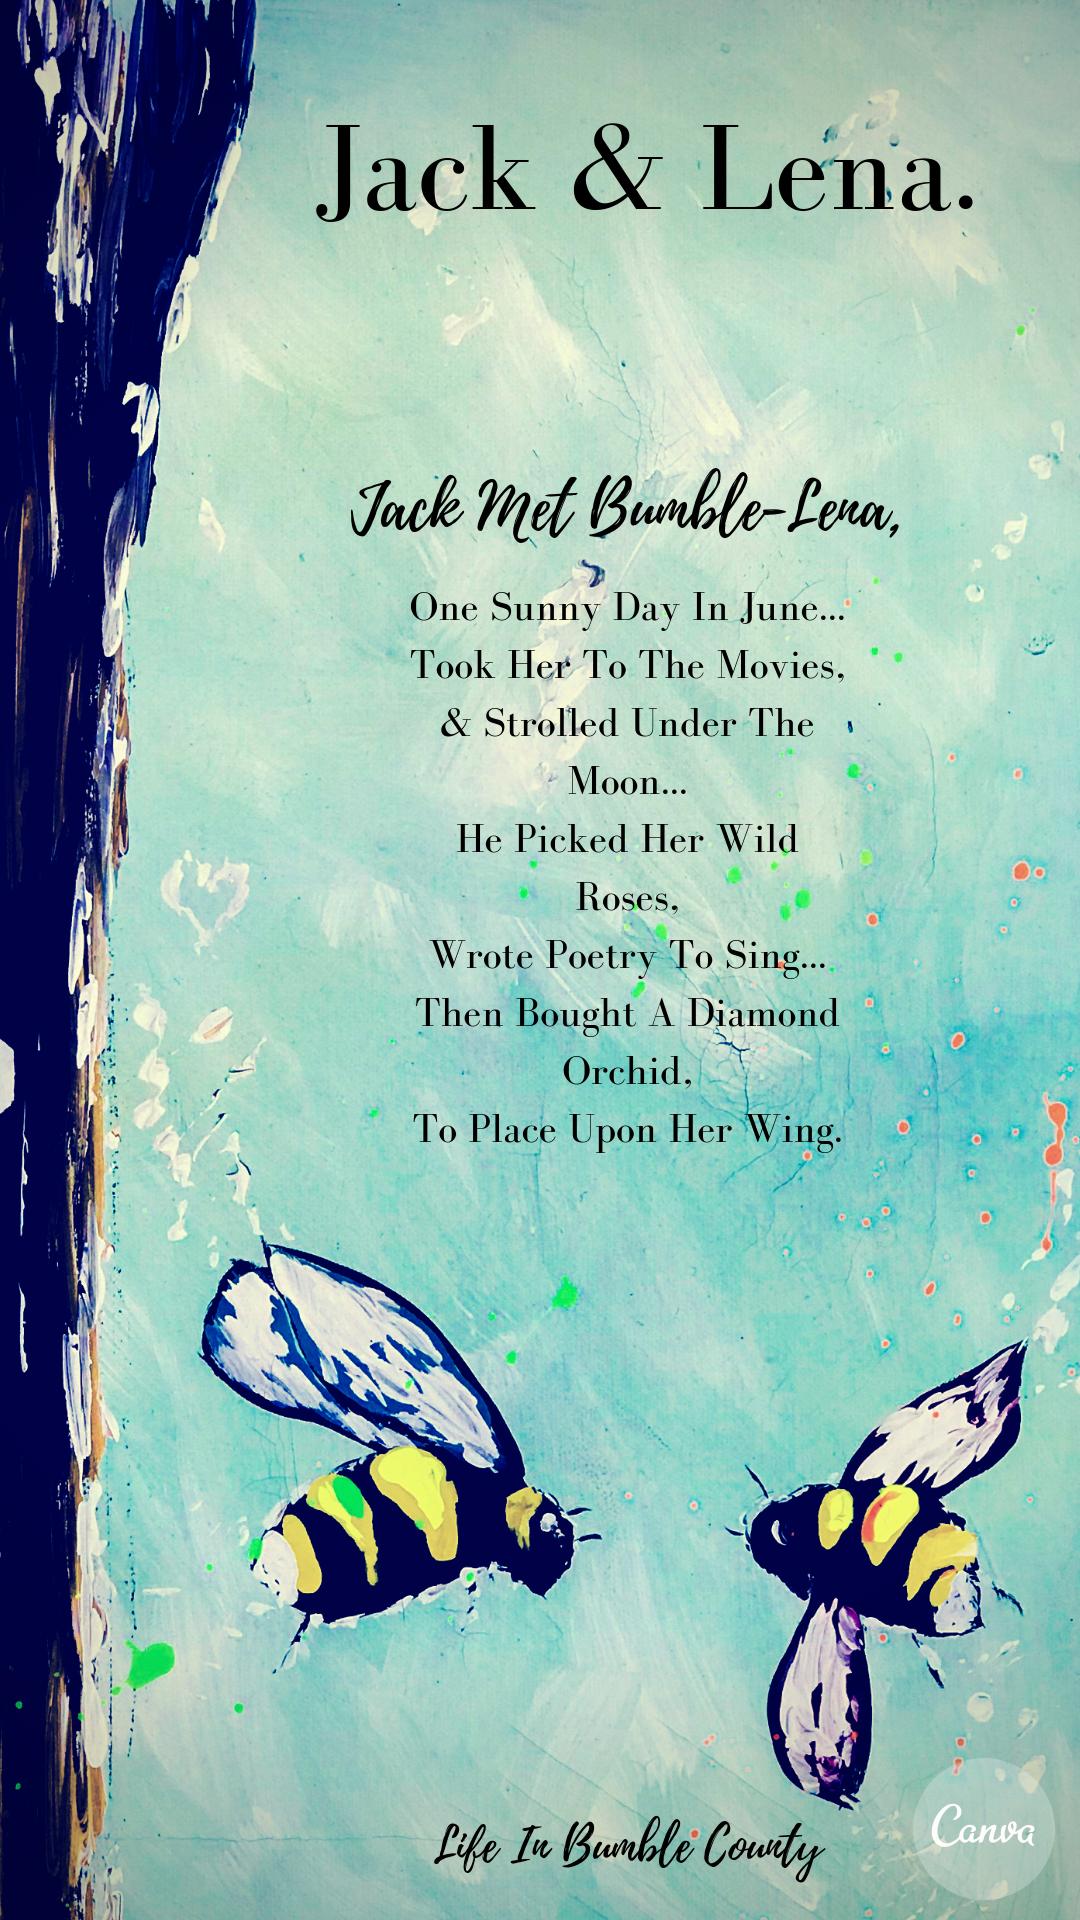 Jack & Lena.